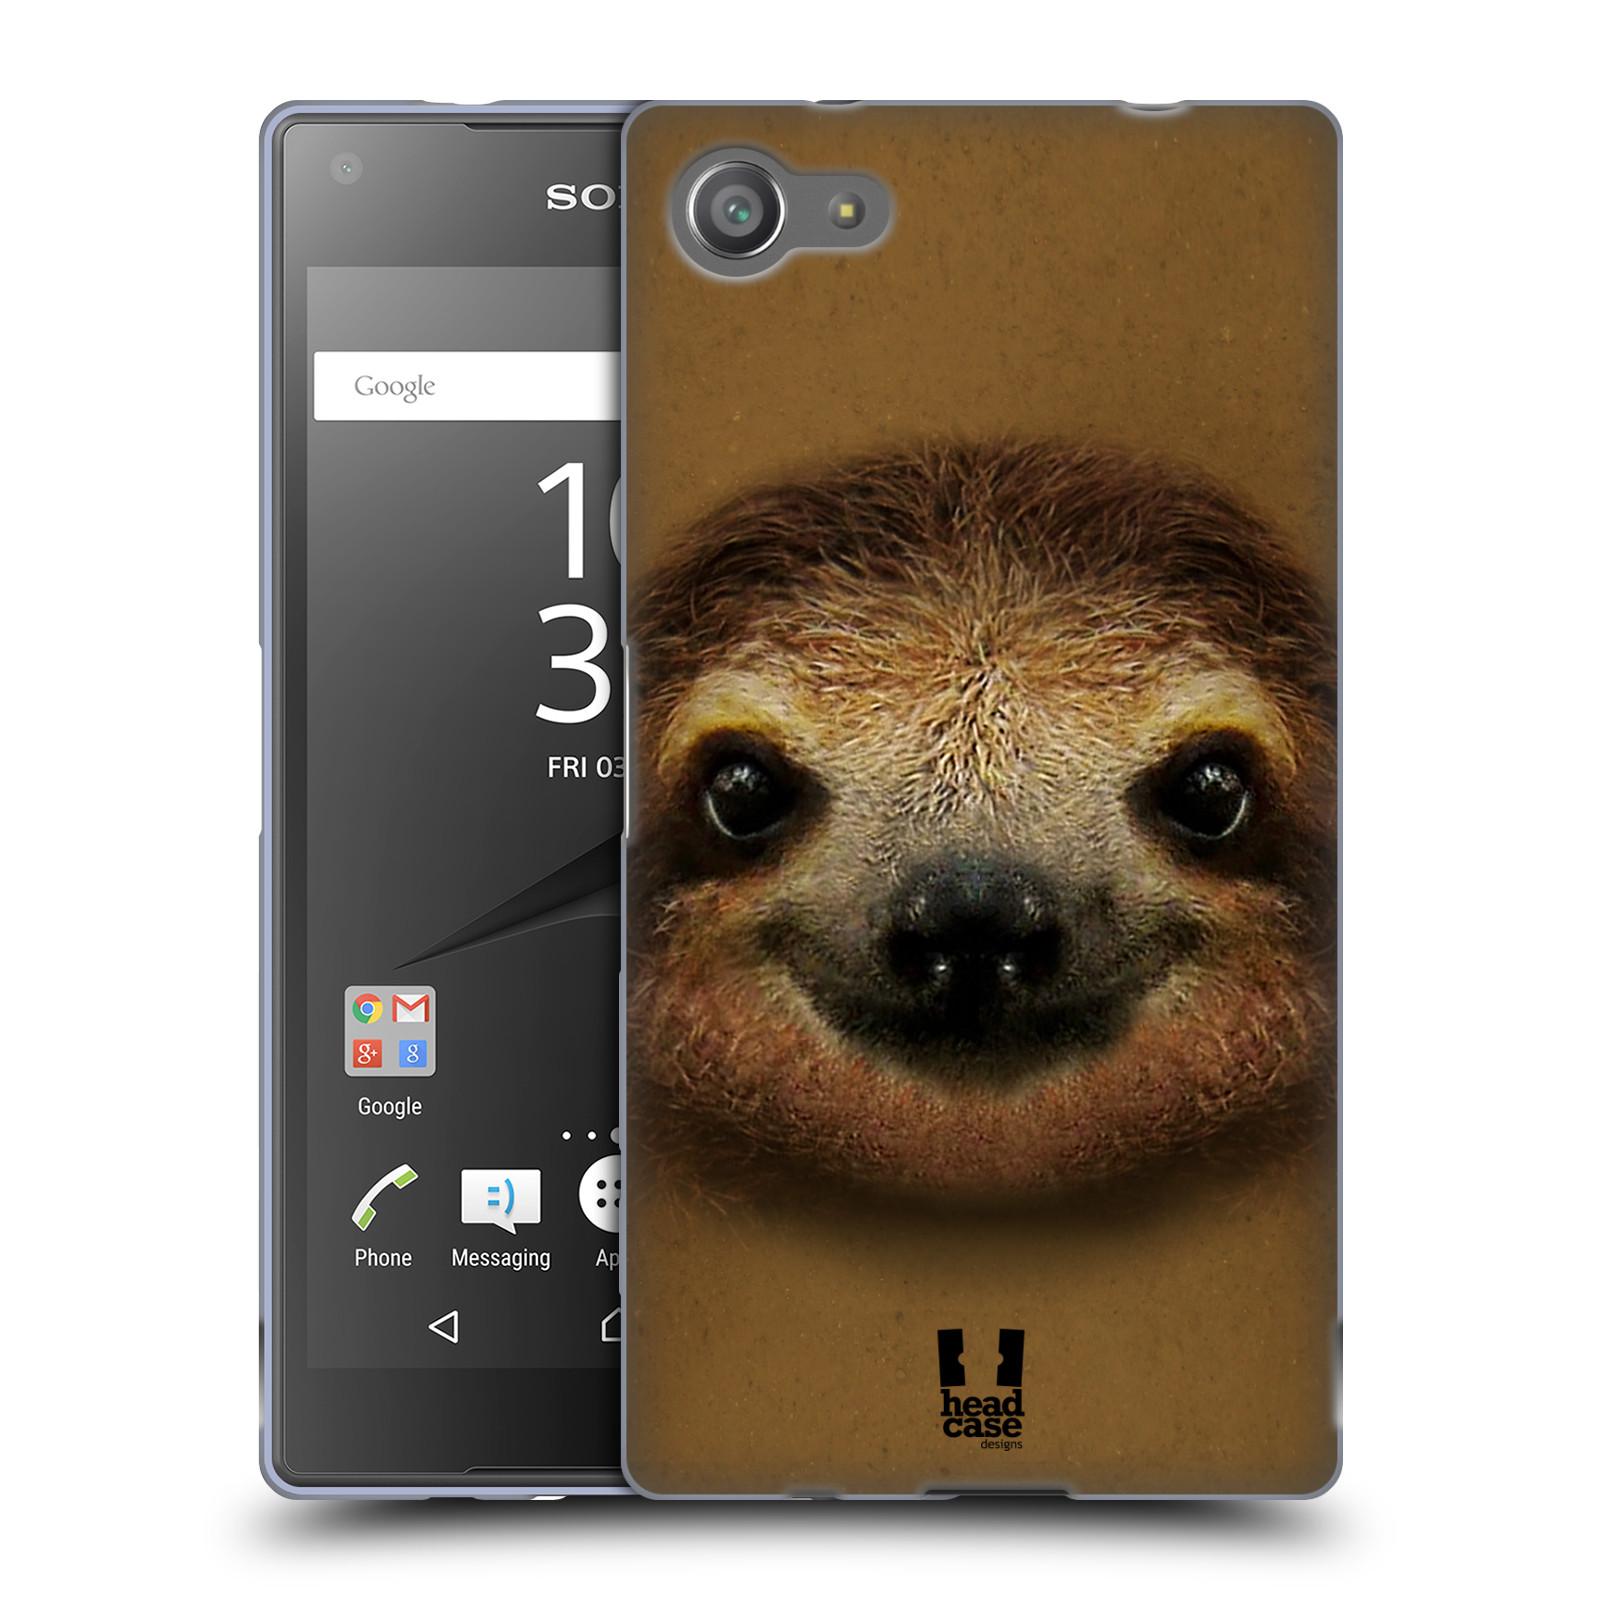 HEAD CASE silikonový obal na mobil Sony Xperia Z5 COMPACT vzor Zvířecí tváře 2 lenochod